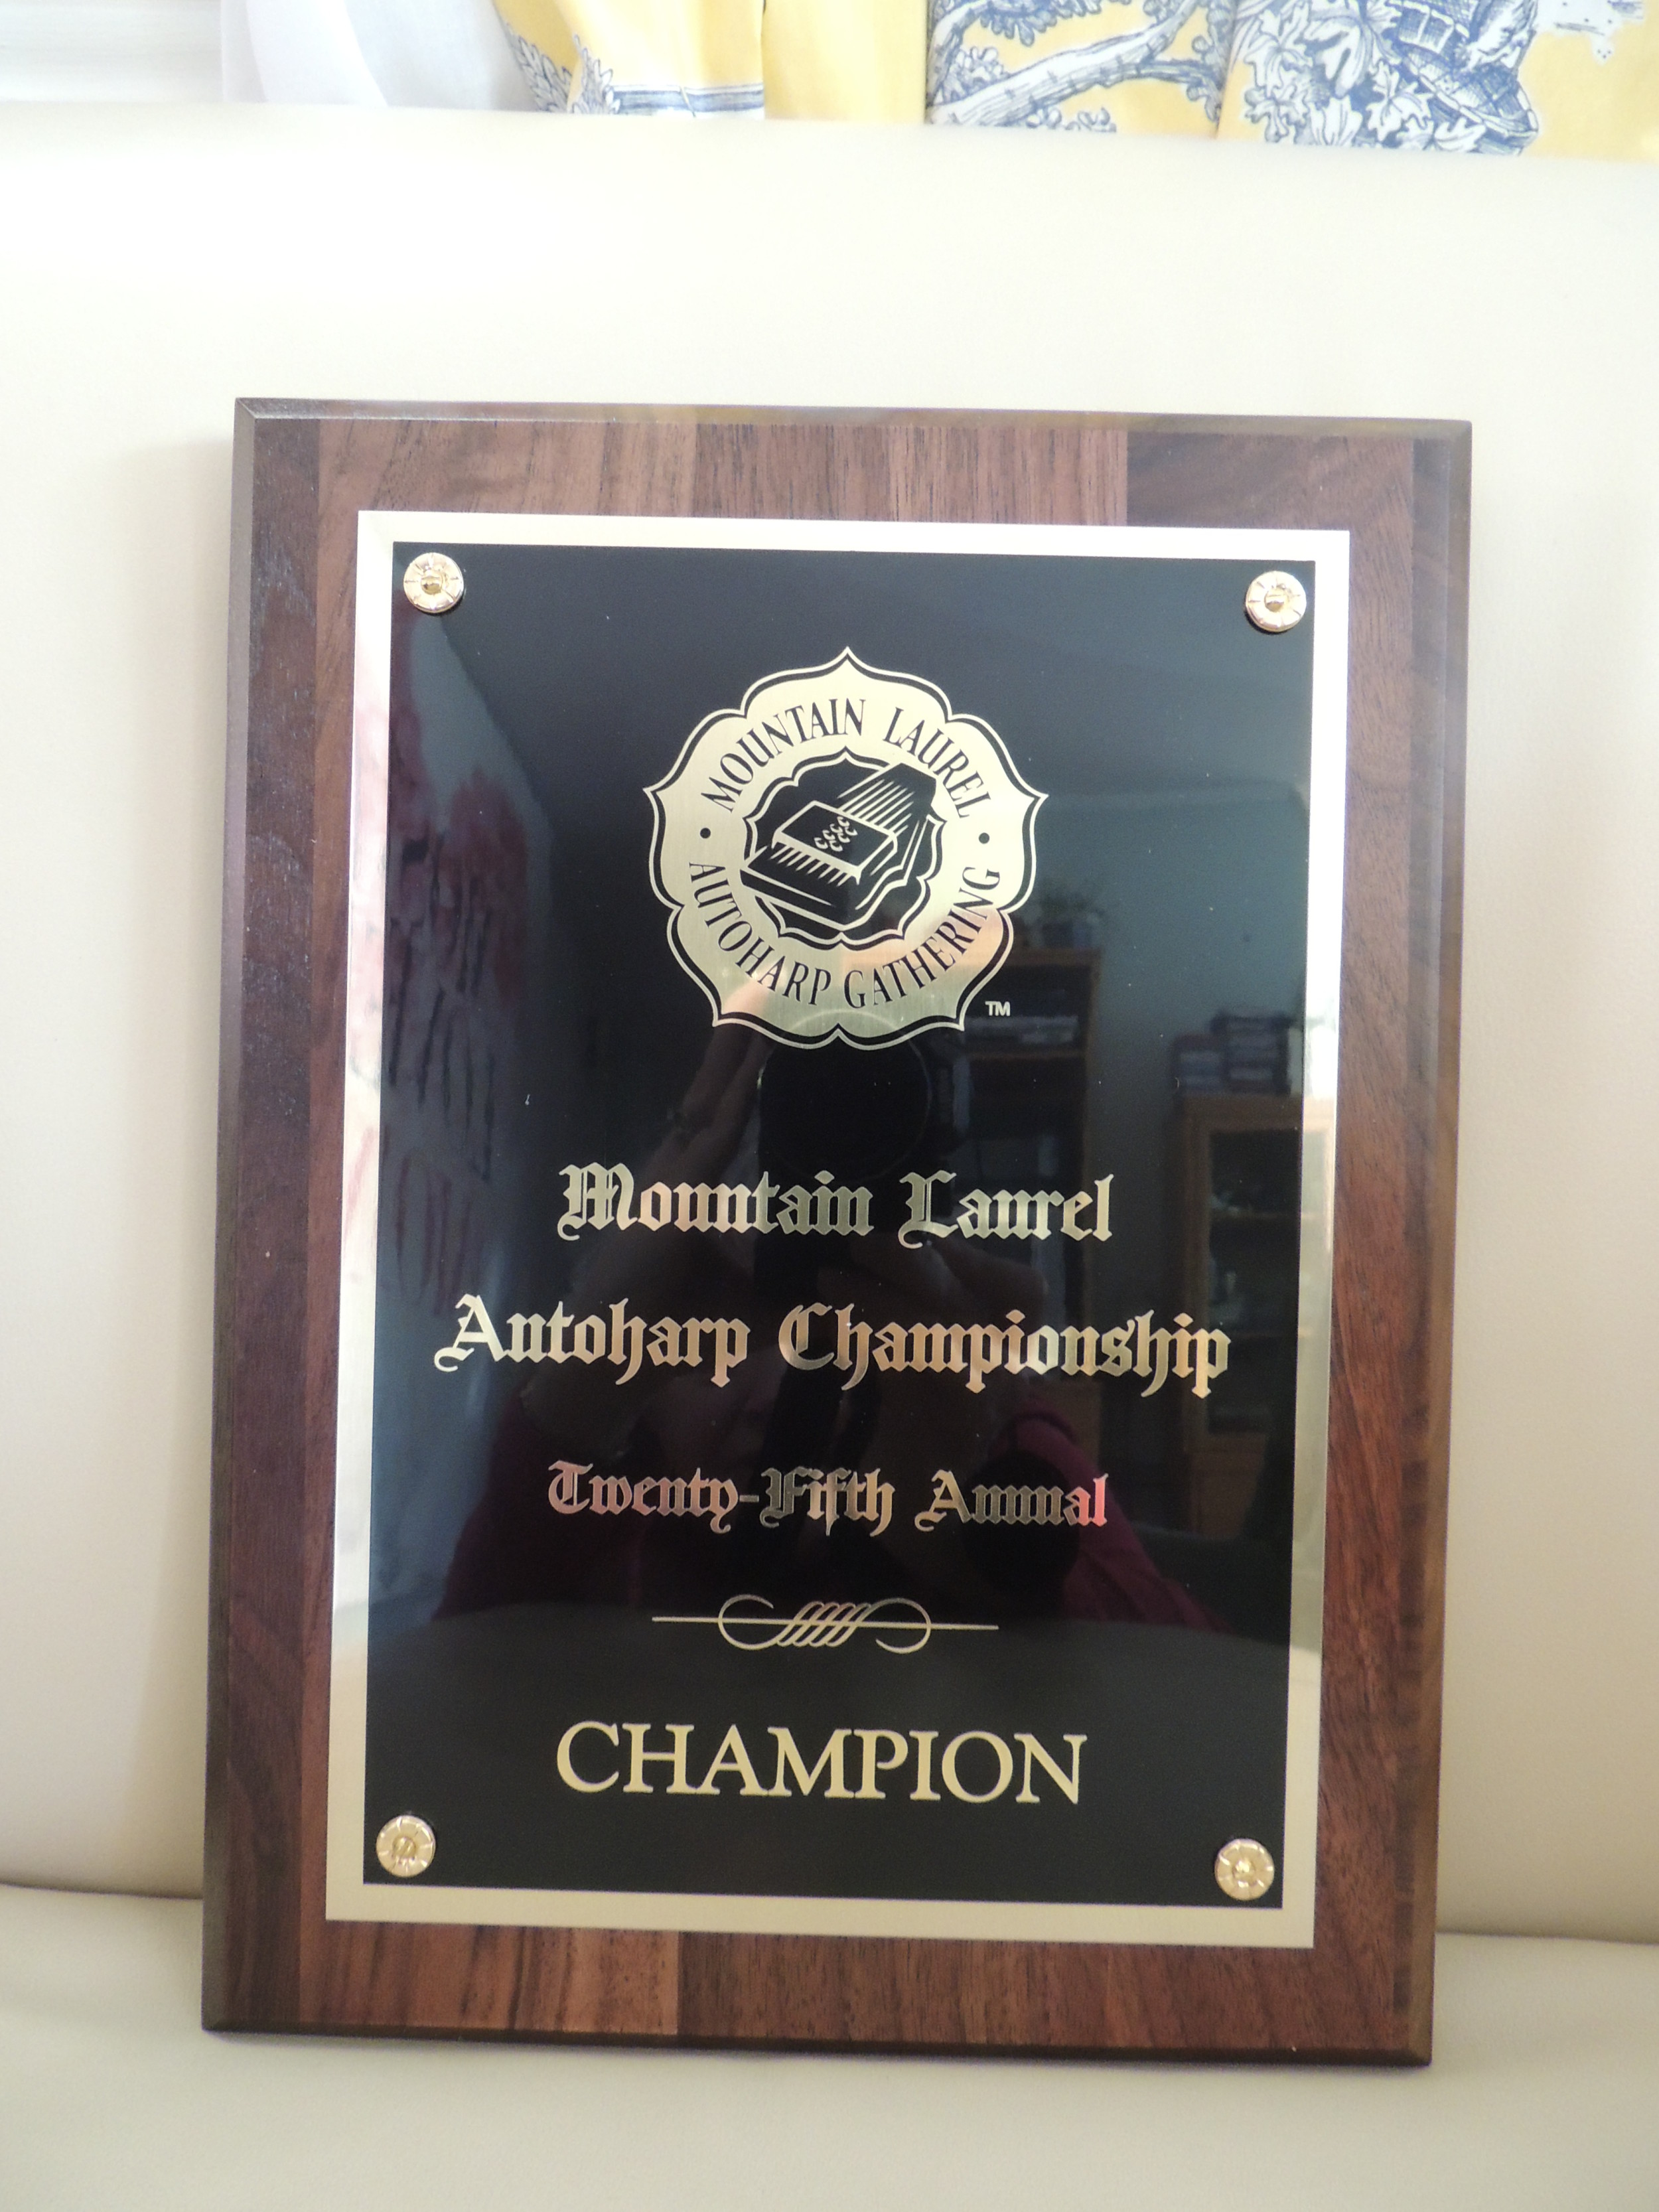 2015 Championship plaque